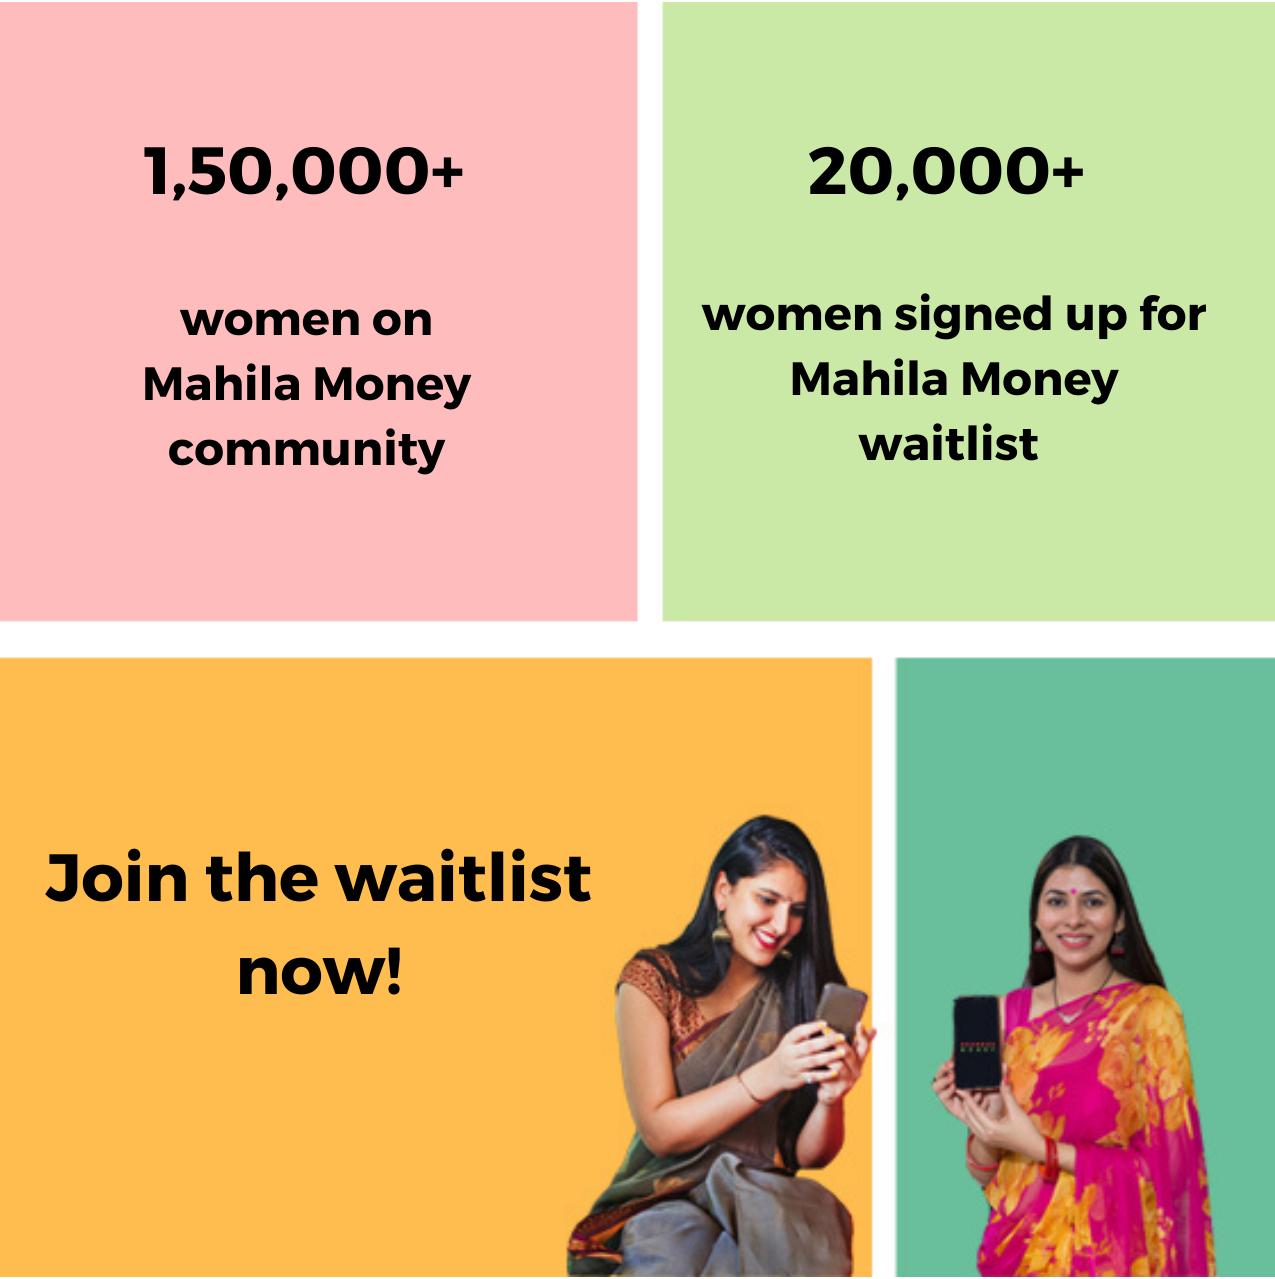 Mahila Money facts and figures , 20000 women on waitlist